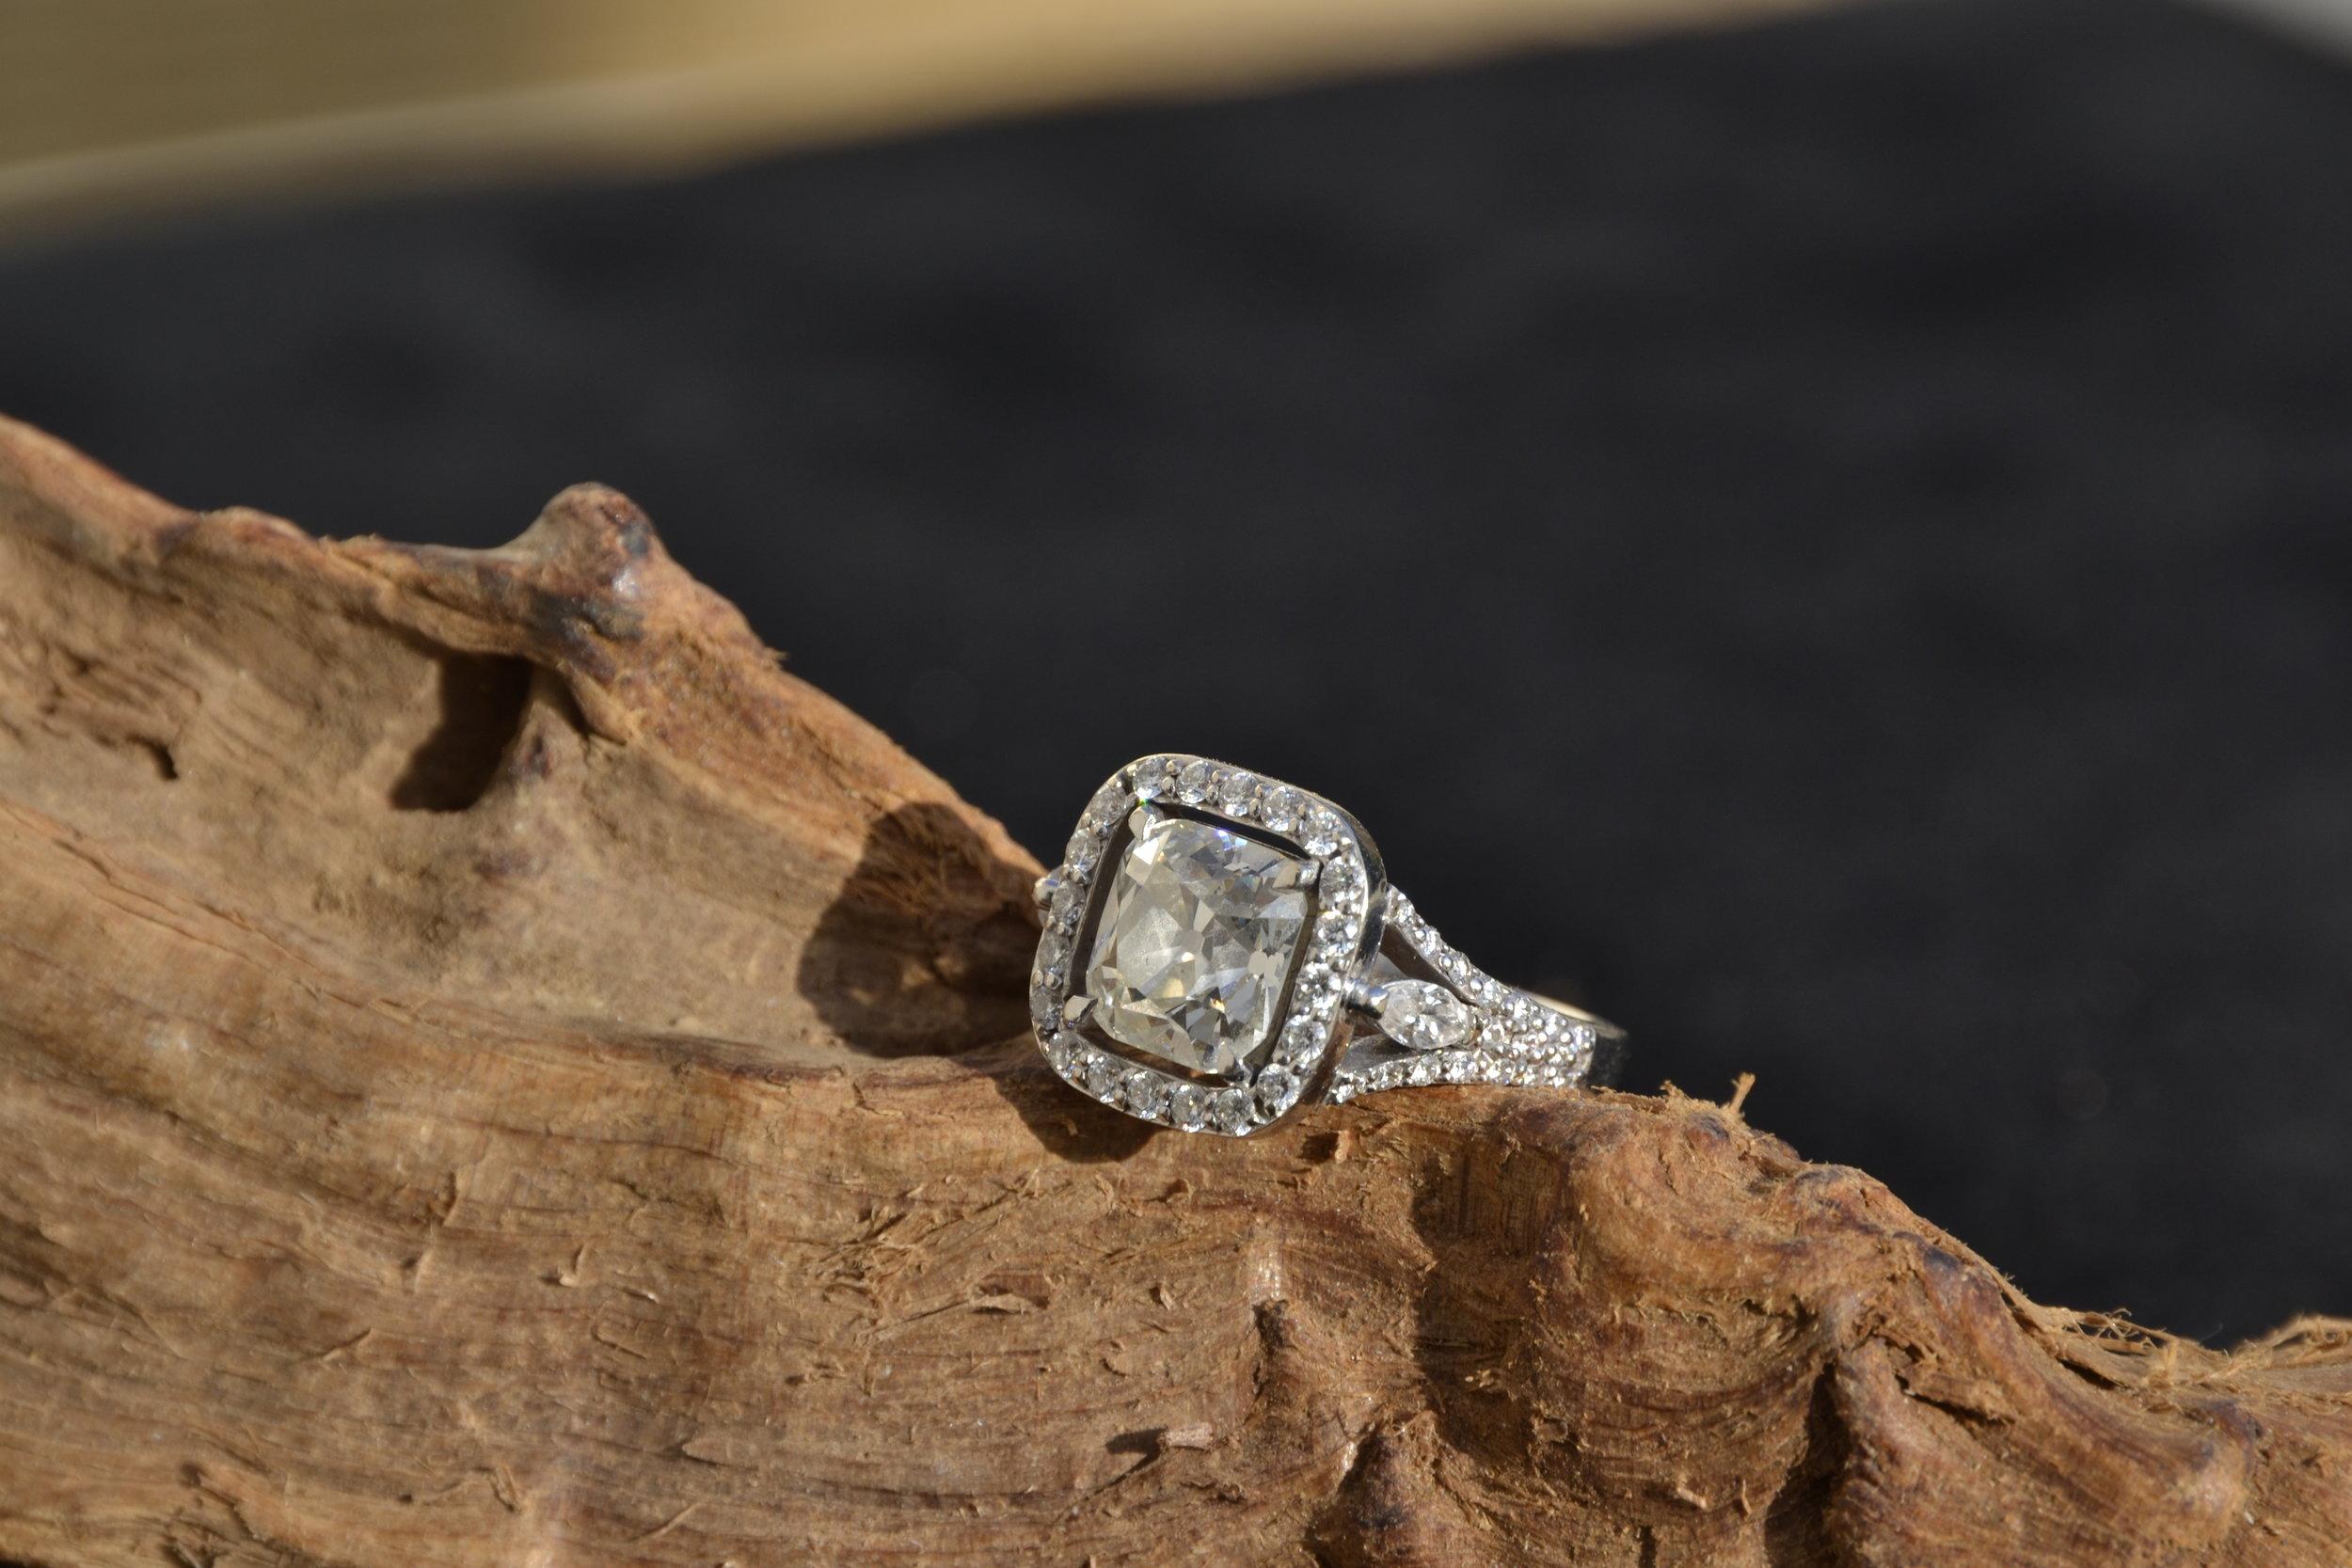 3.3 carat old mine cushion cut diamond set with diamonds